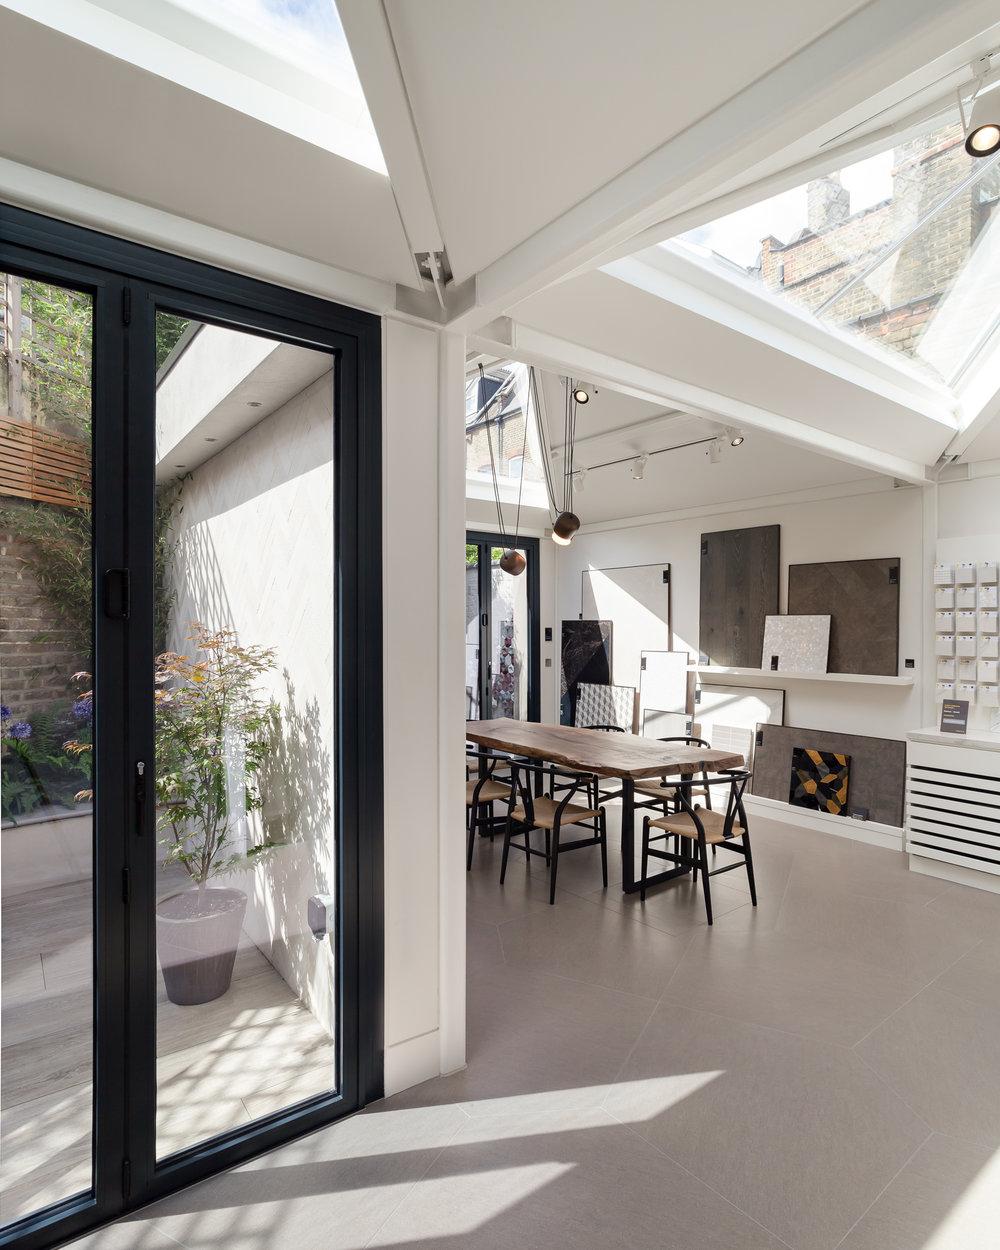 Pano_1626_1628-Edit - 210318_Mailen_Design_Domus_Battersea - Website.jpg